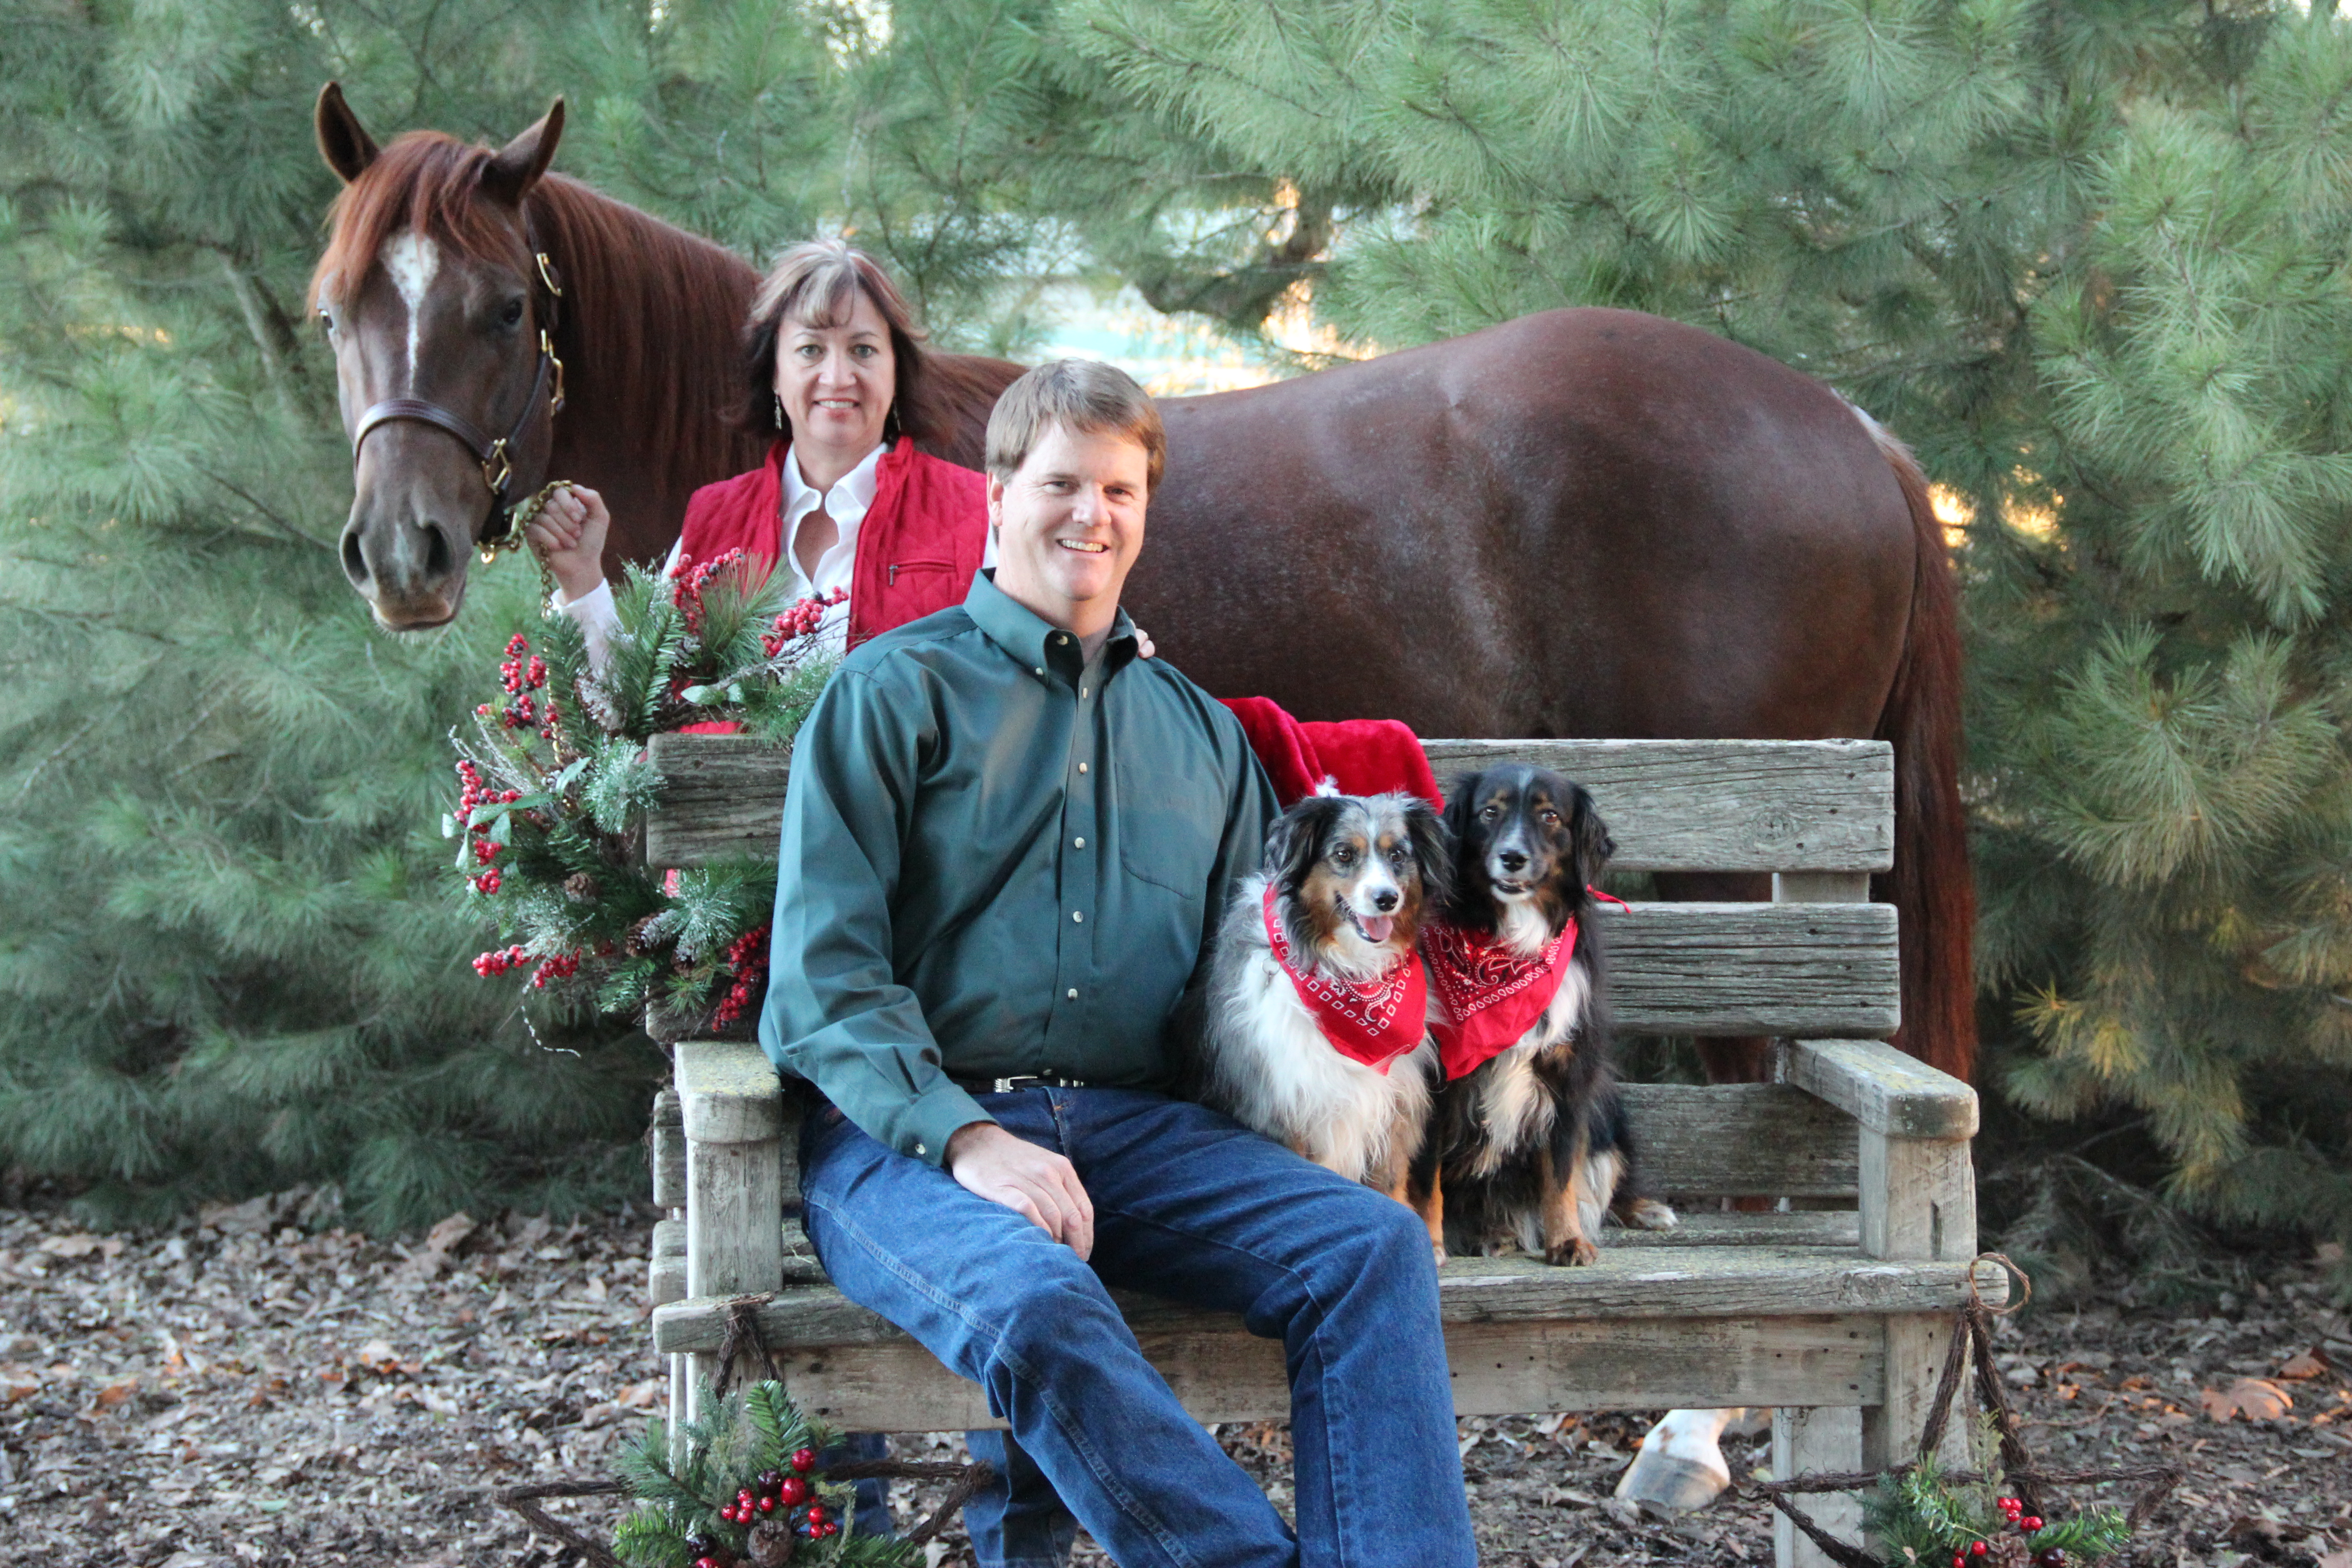 Lindberg Family Christmas Alaphotographyblog